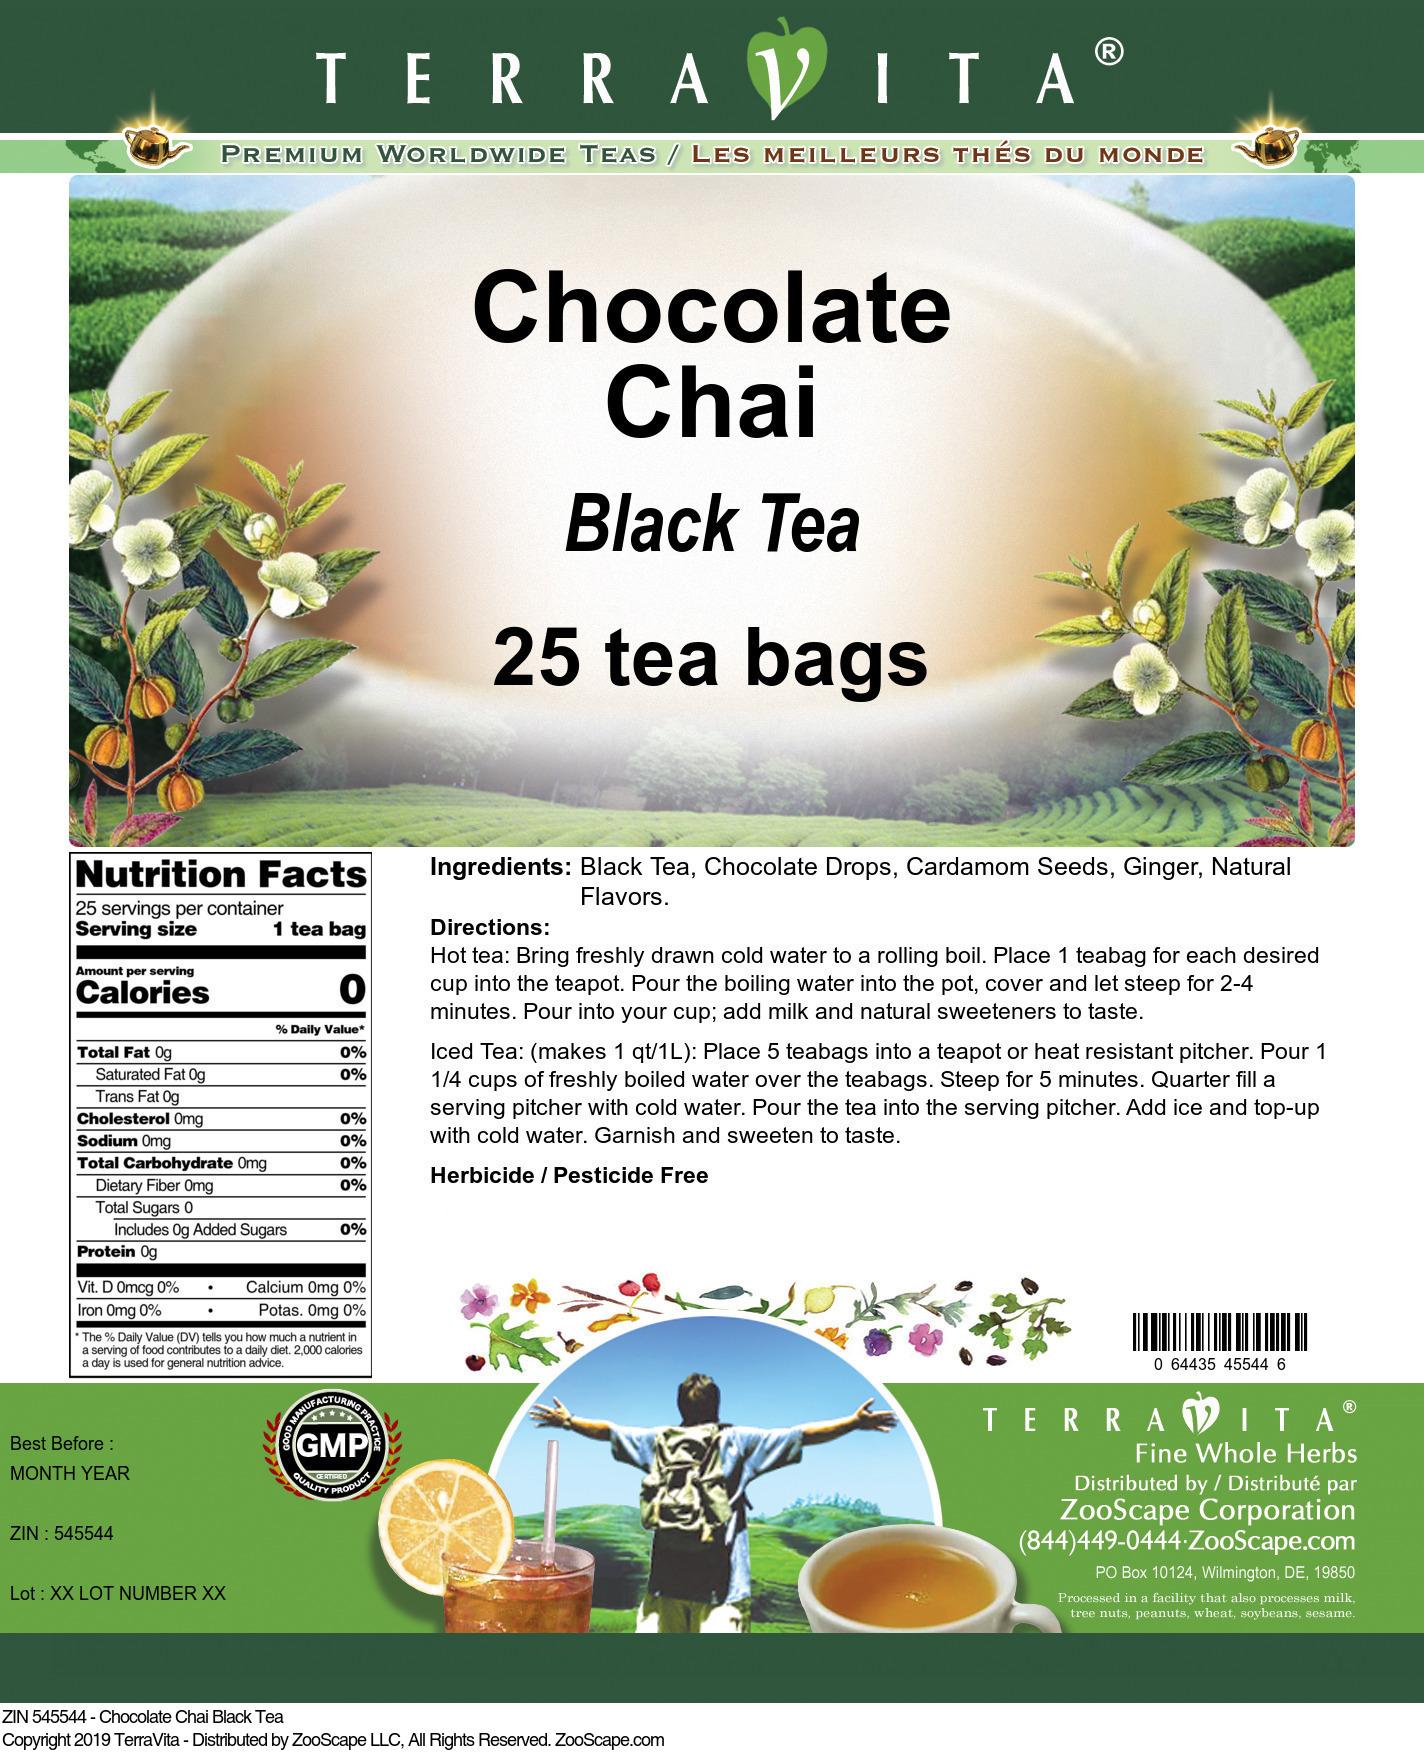 Chocolate Chai Black Tea